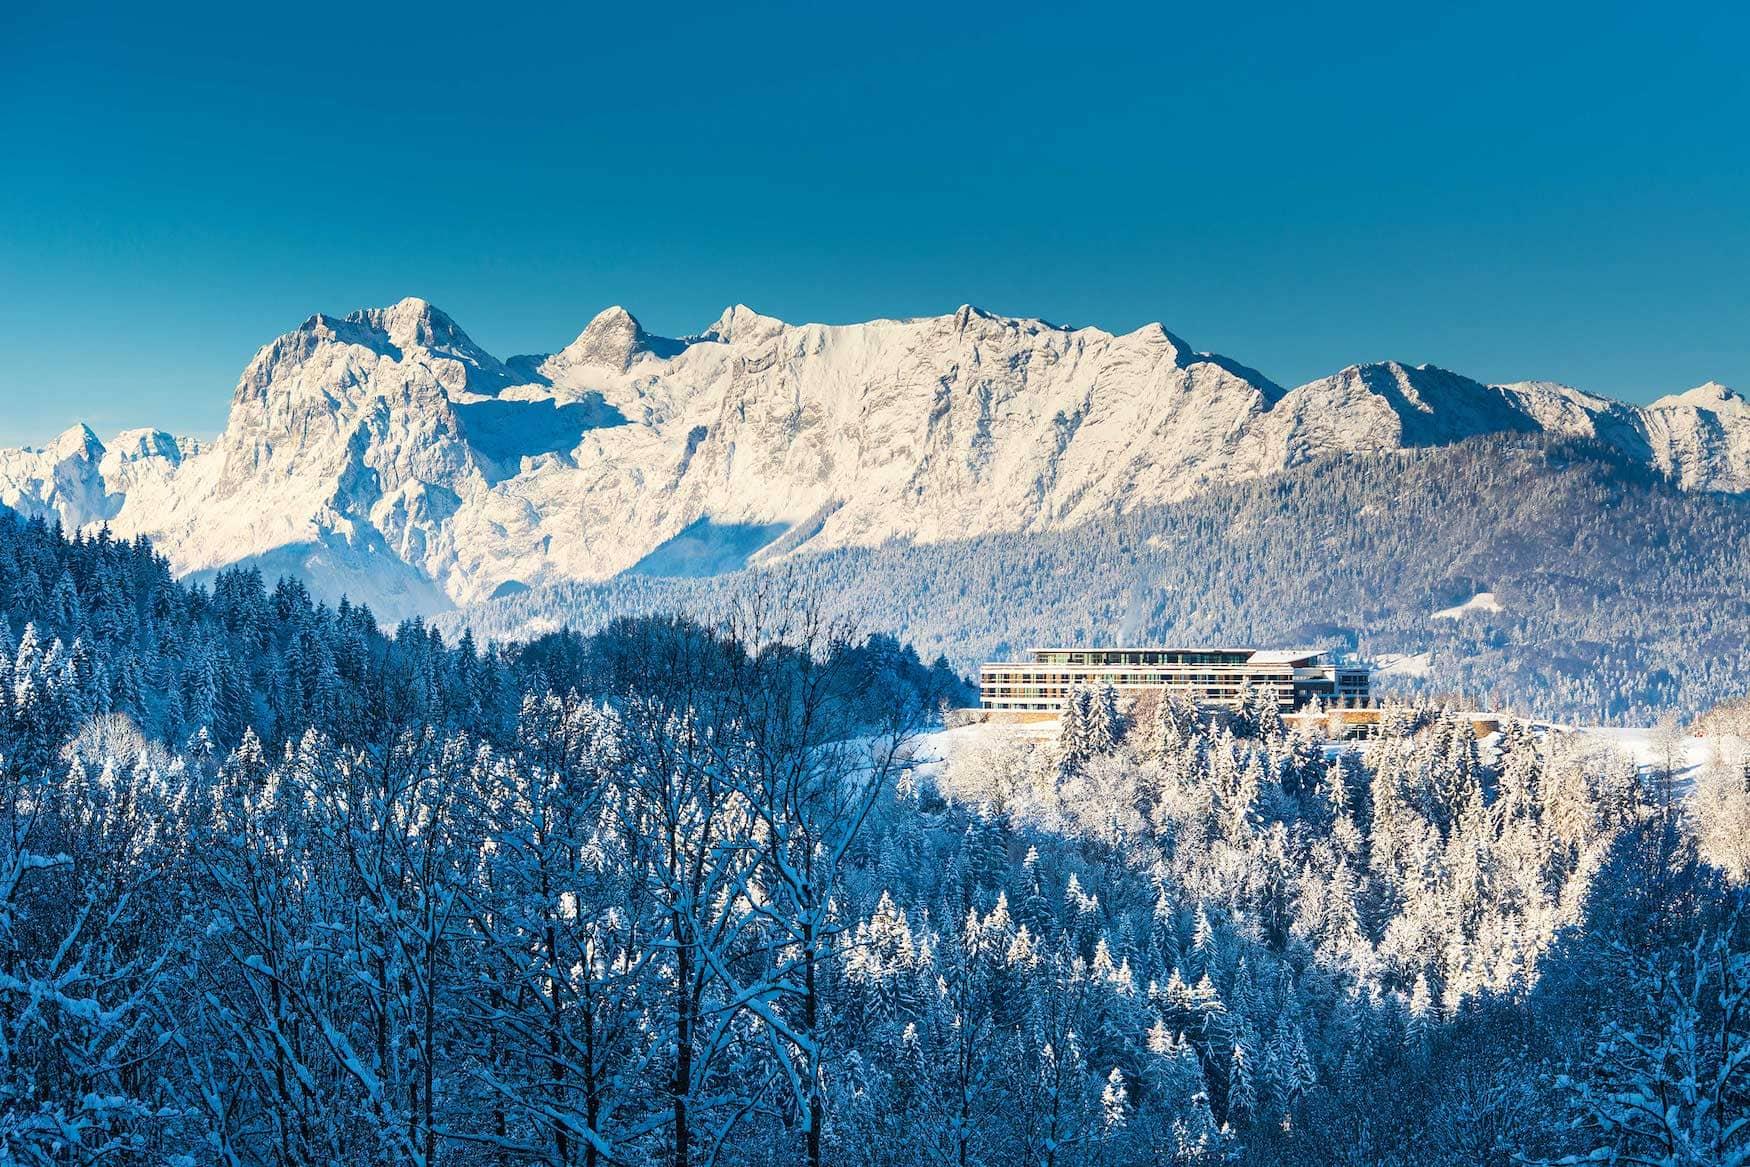 Das Kempinski Hotel Berchtesgaden verschneit im Winter.